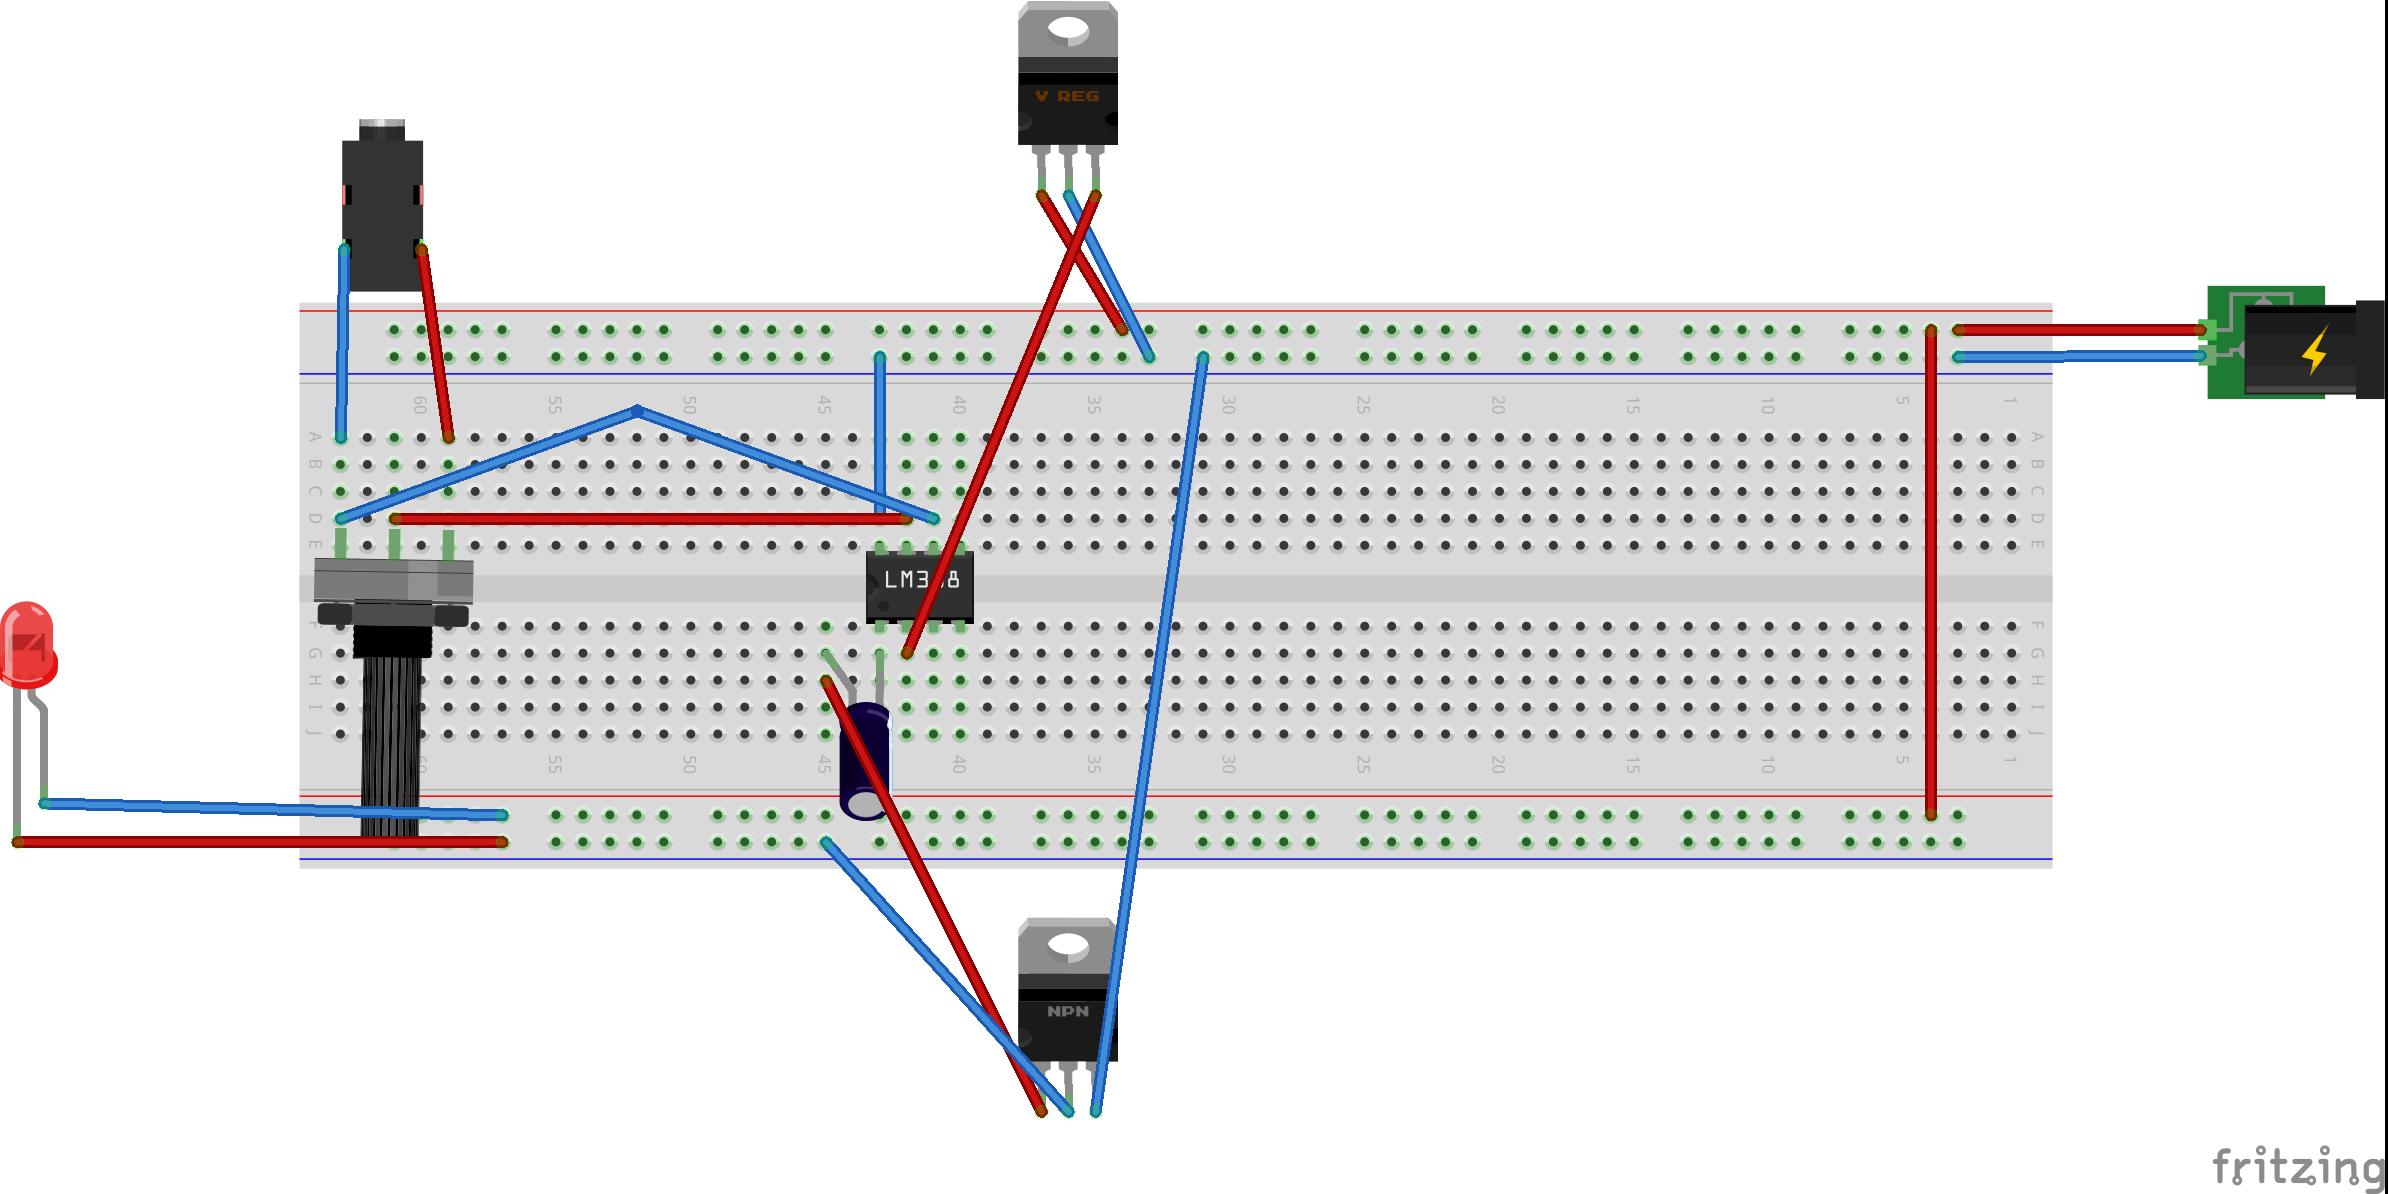 Fine Amplifier Led Strip Flash To Music Electrical Engineering Stack Wiring Cloud Loplapiotaidewilluminateatxorg